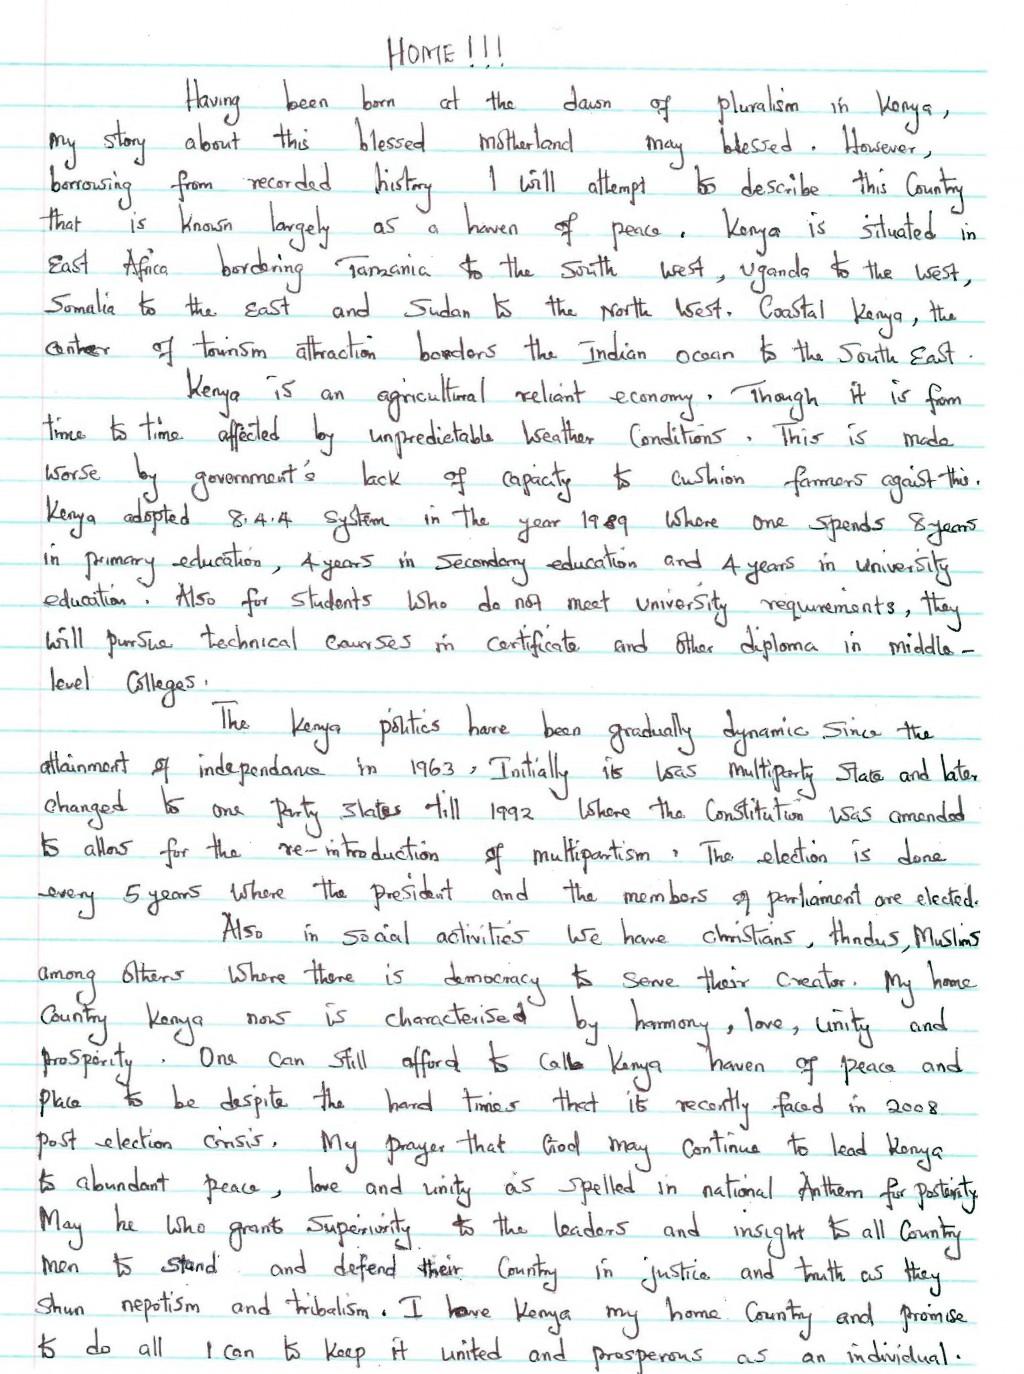 005 My Dream House Descriptive Essay Description Sweet Home Wr Writing Beautiful Ideal Town Large